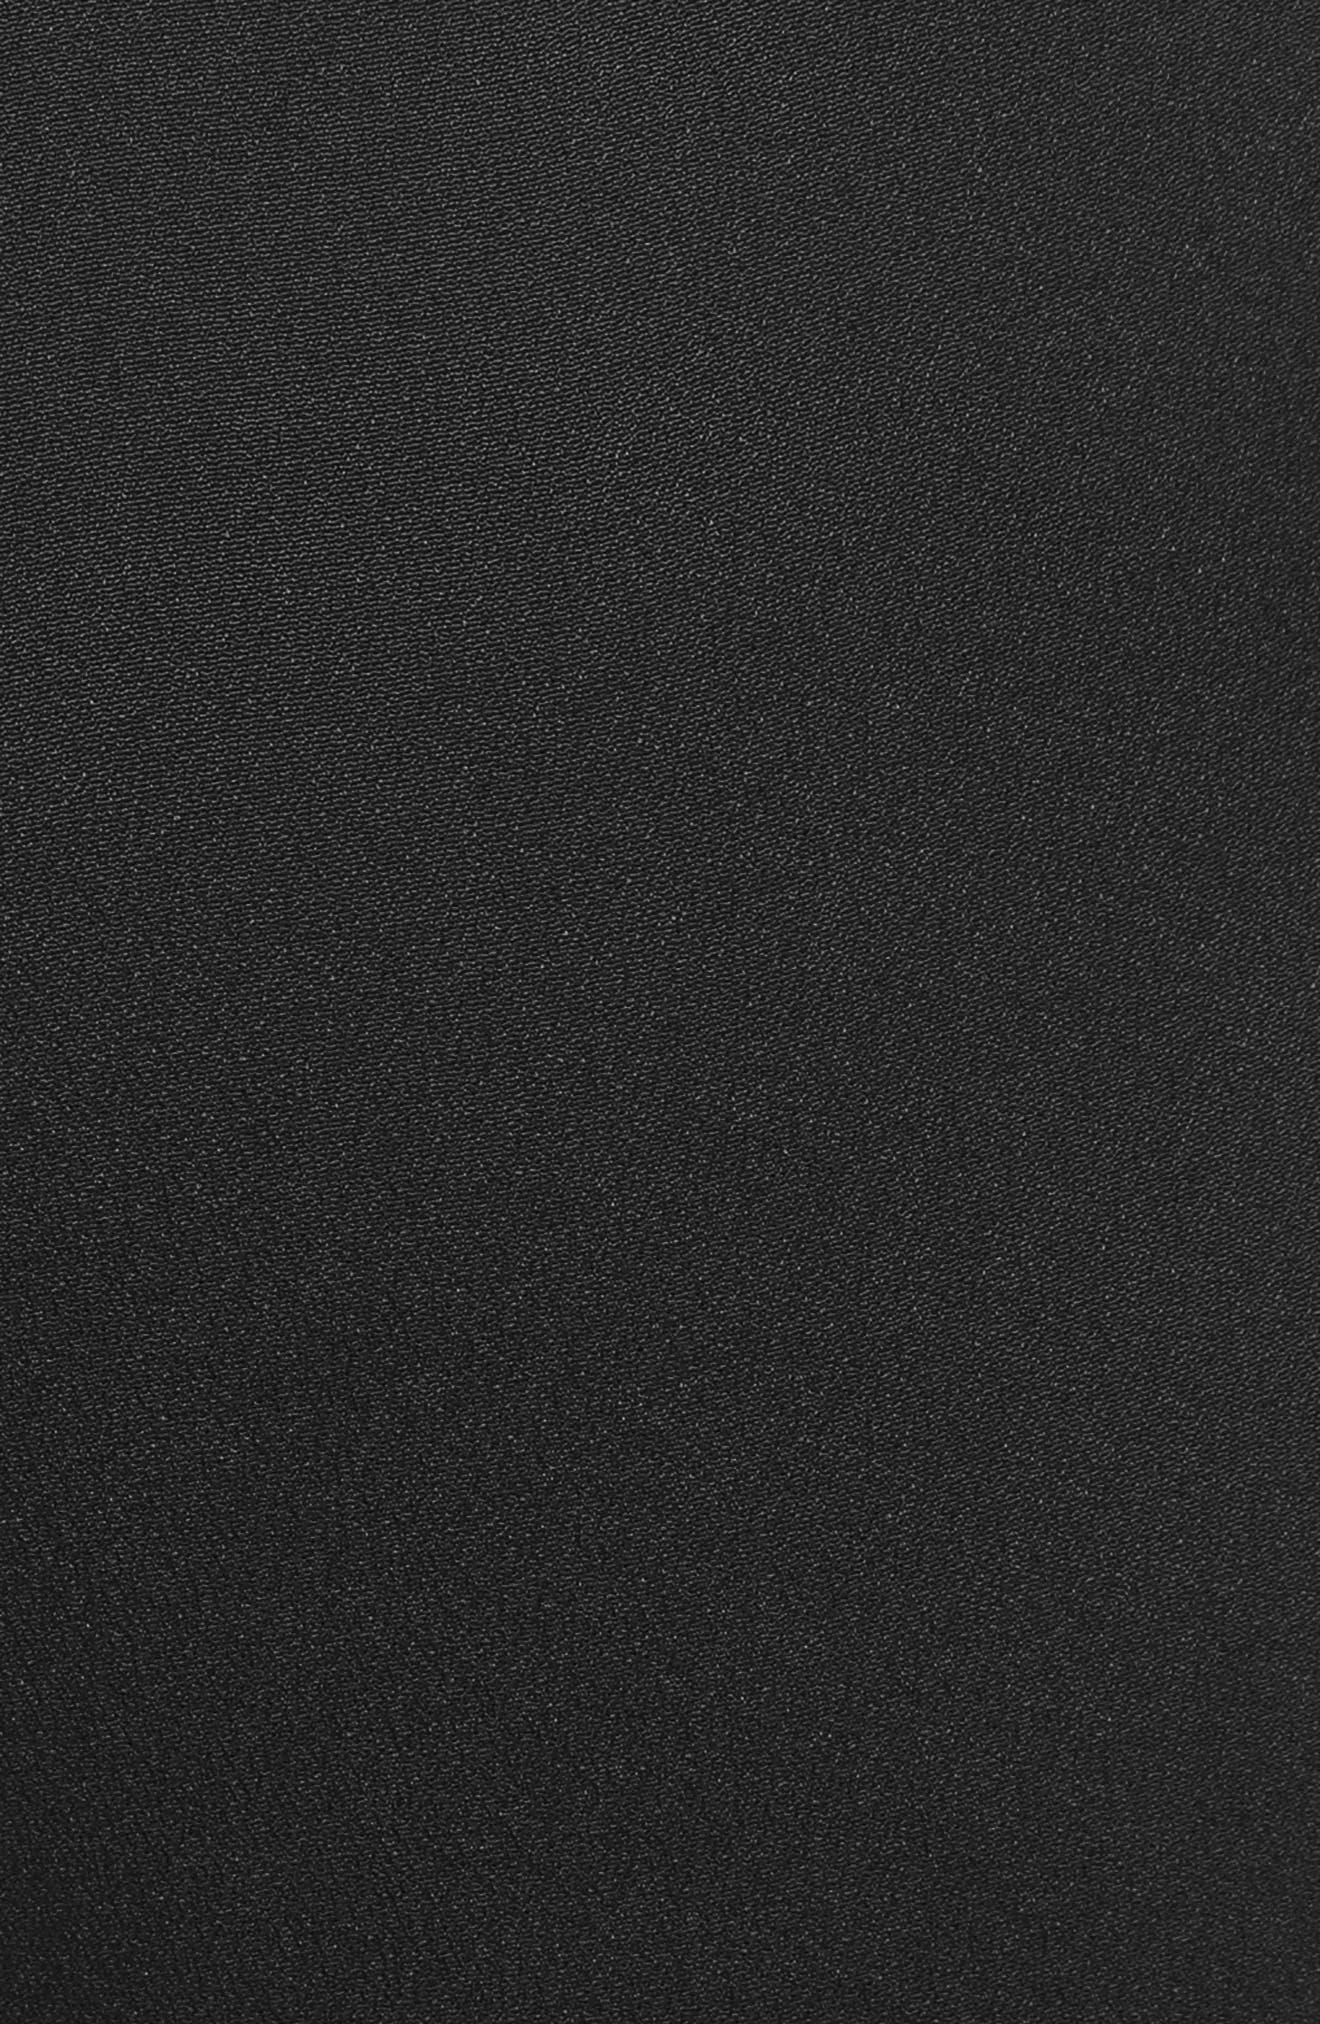 Crop Drawstring Pants,                             Alternate thumbnail 5, color,                             Black